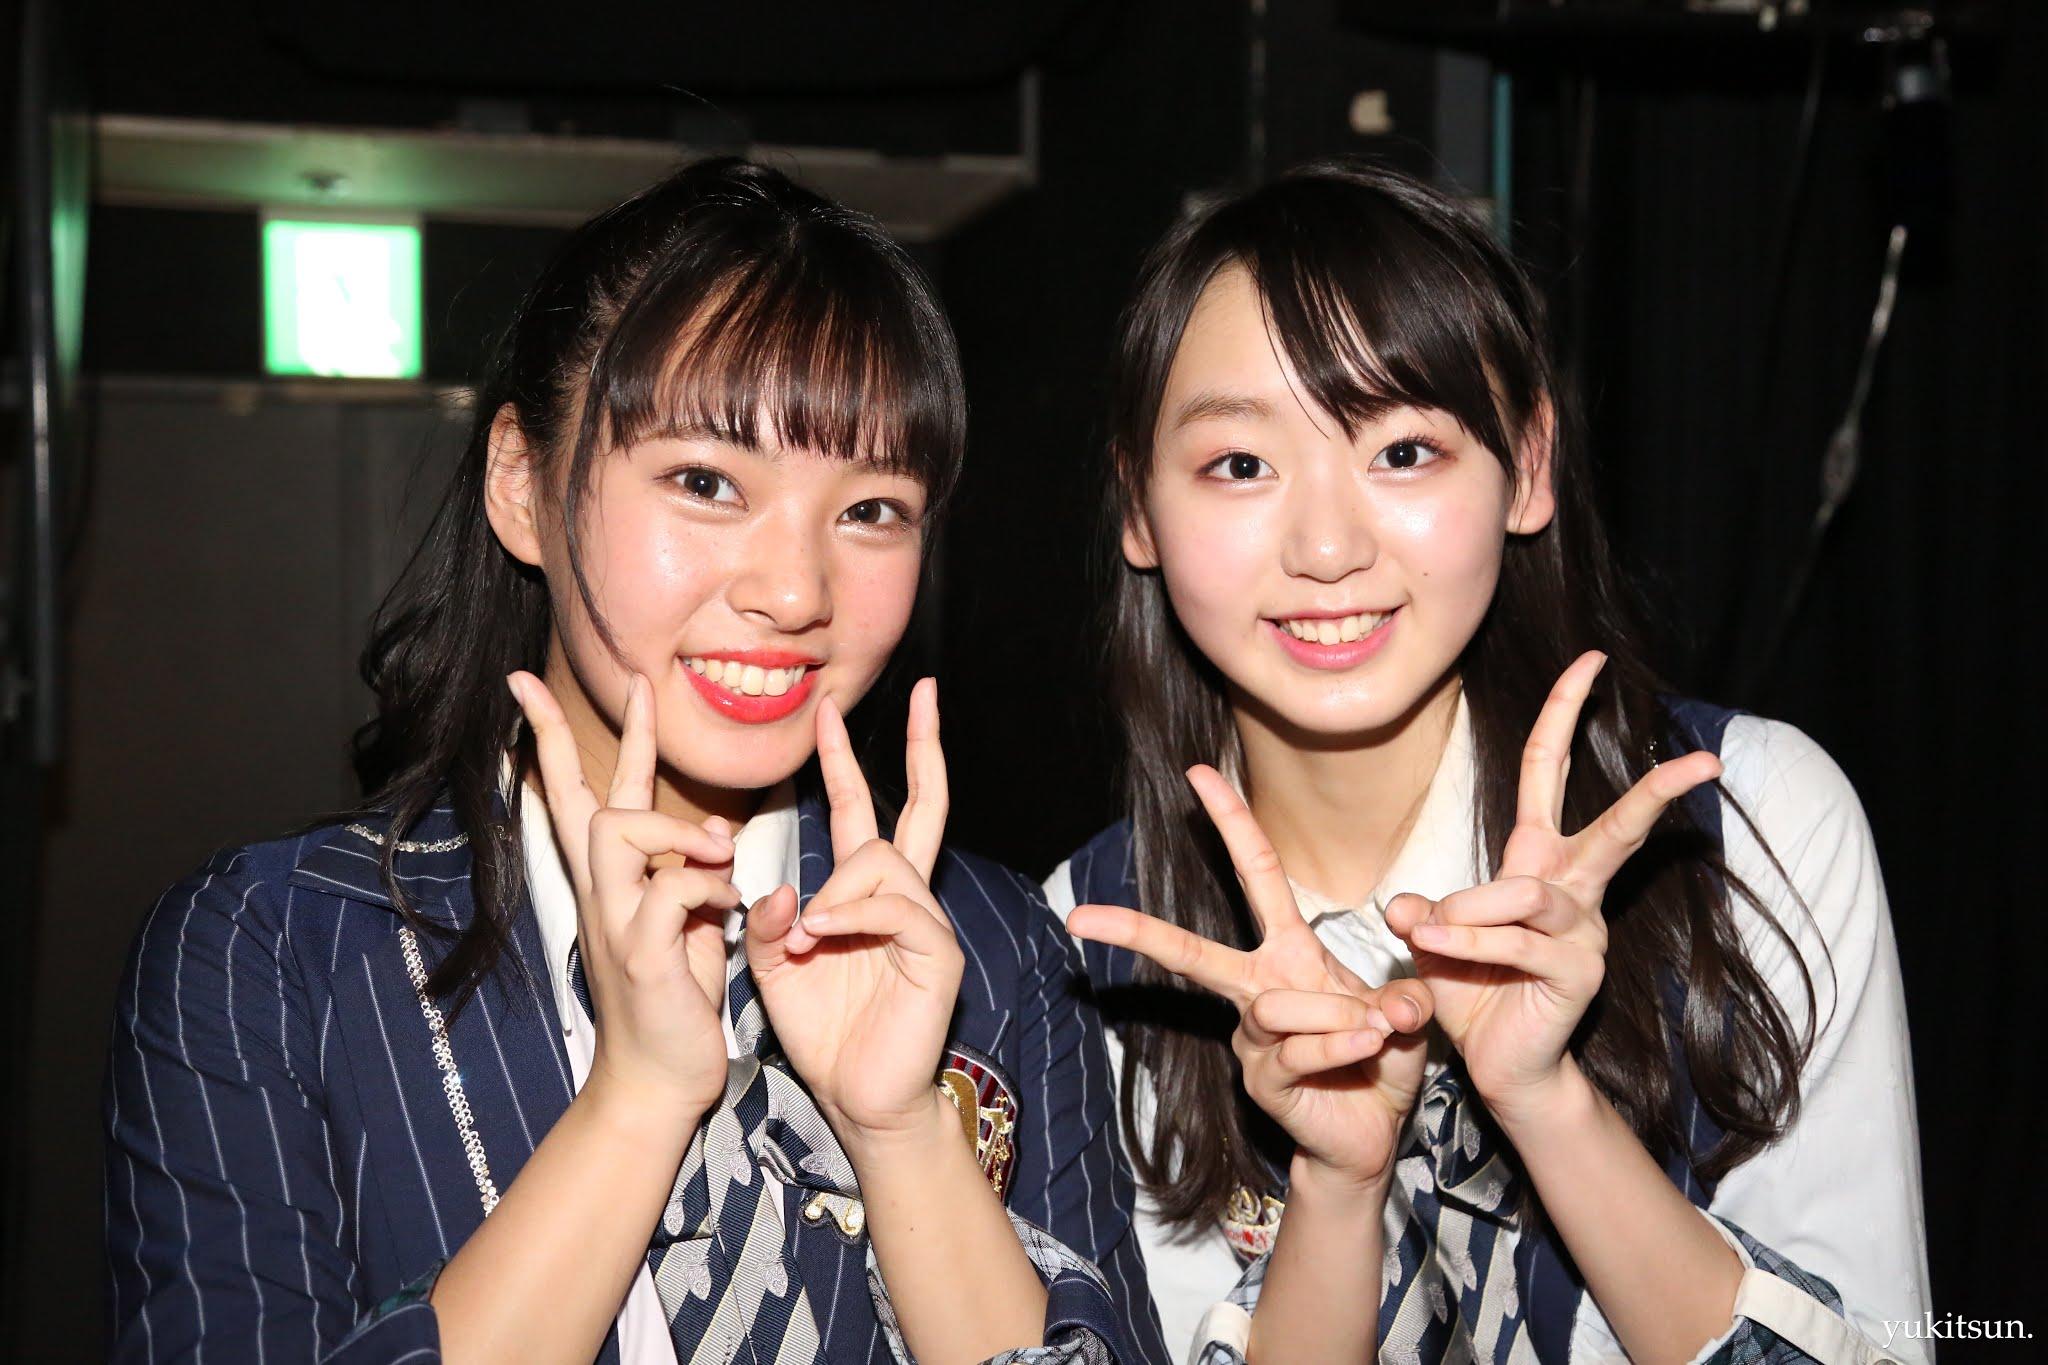 yuzu-16